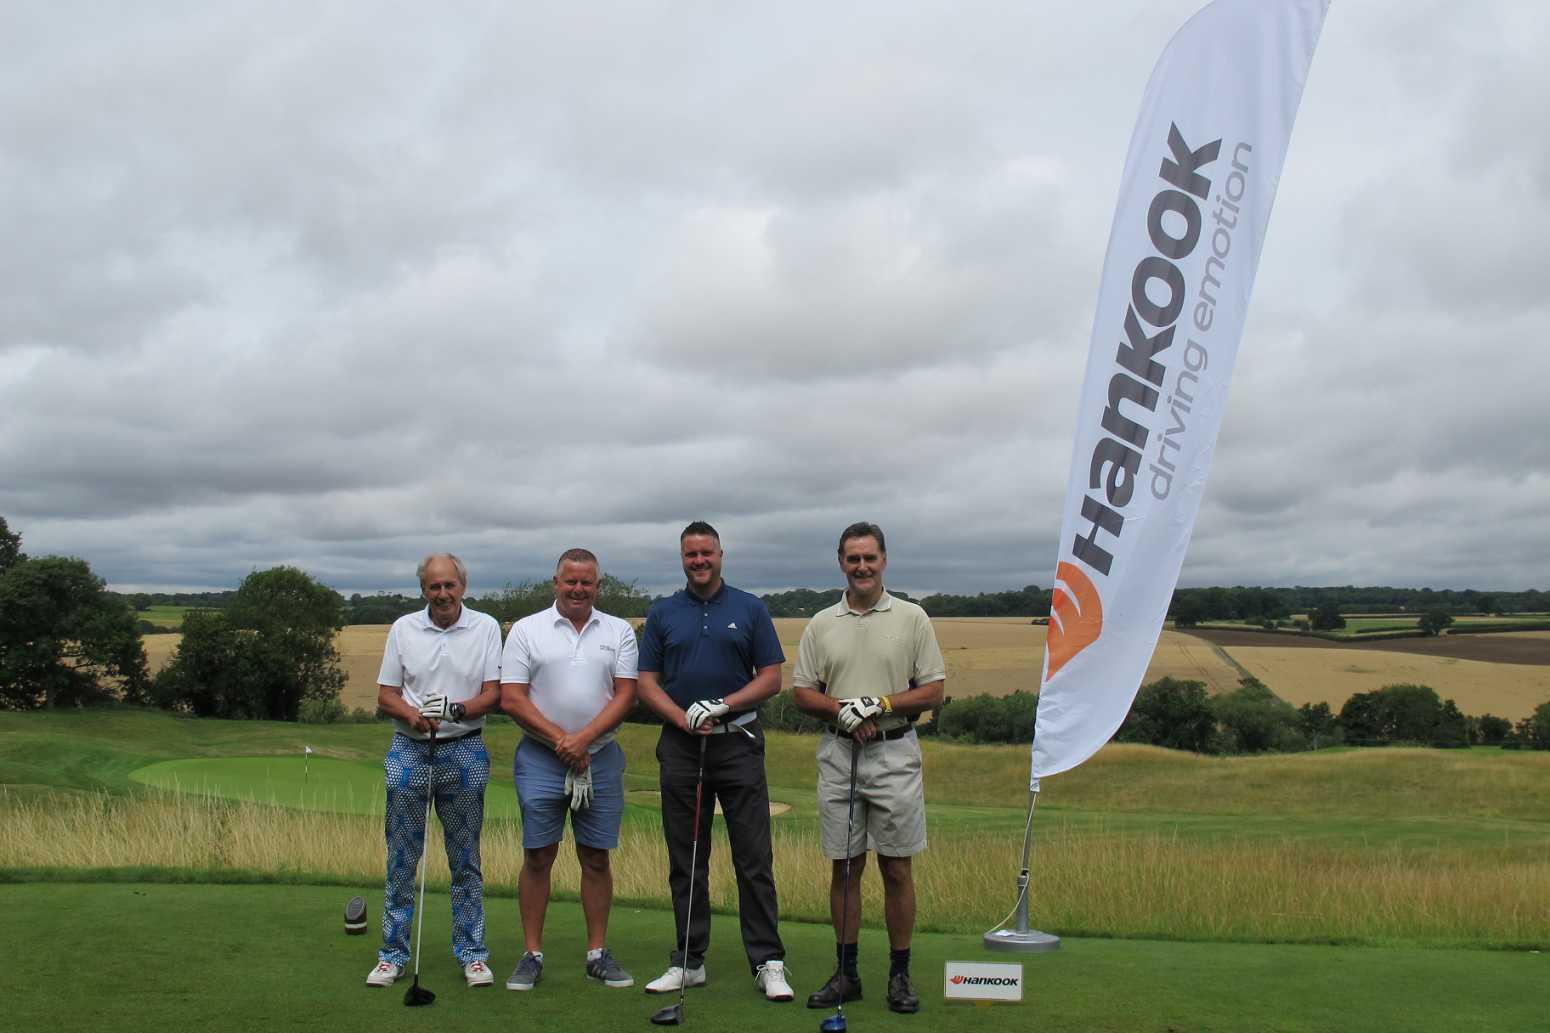 Watling Tyre's Patrick Laming and Nigel Payne at the Hankook Golf Classic